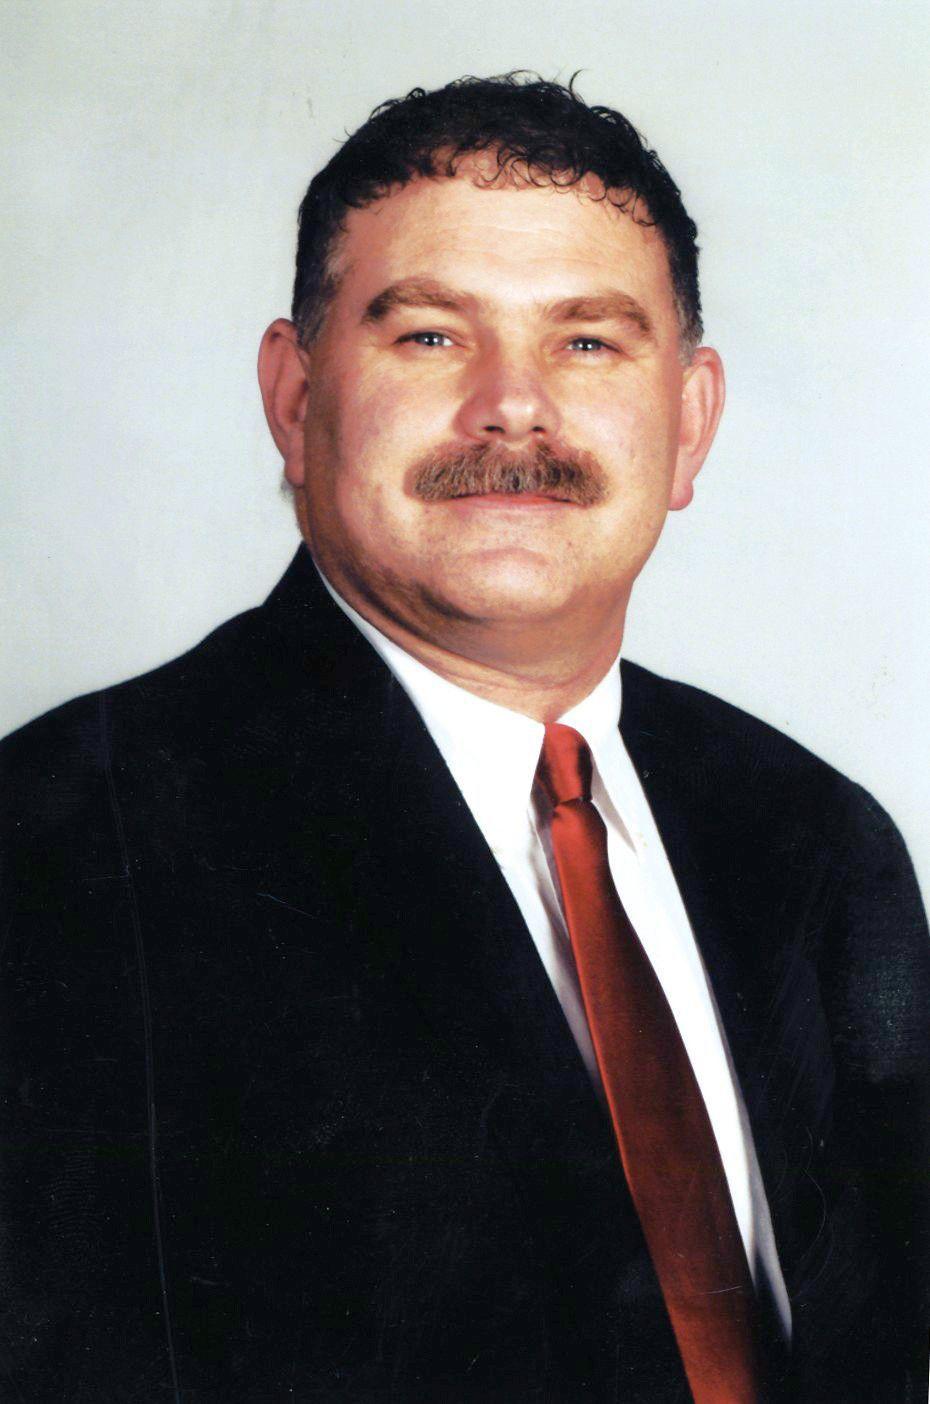 Mike Lange